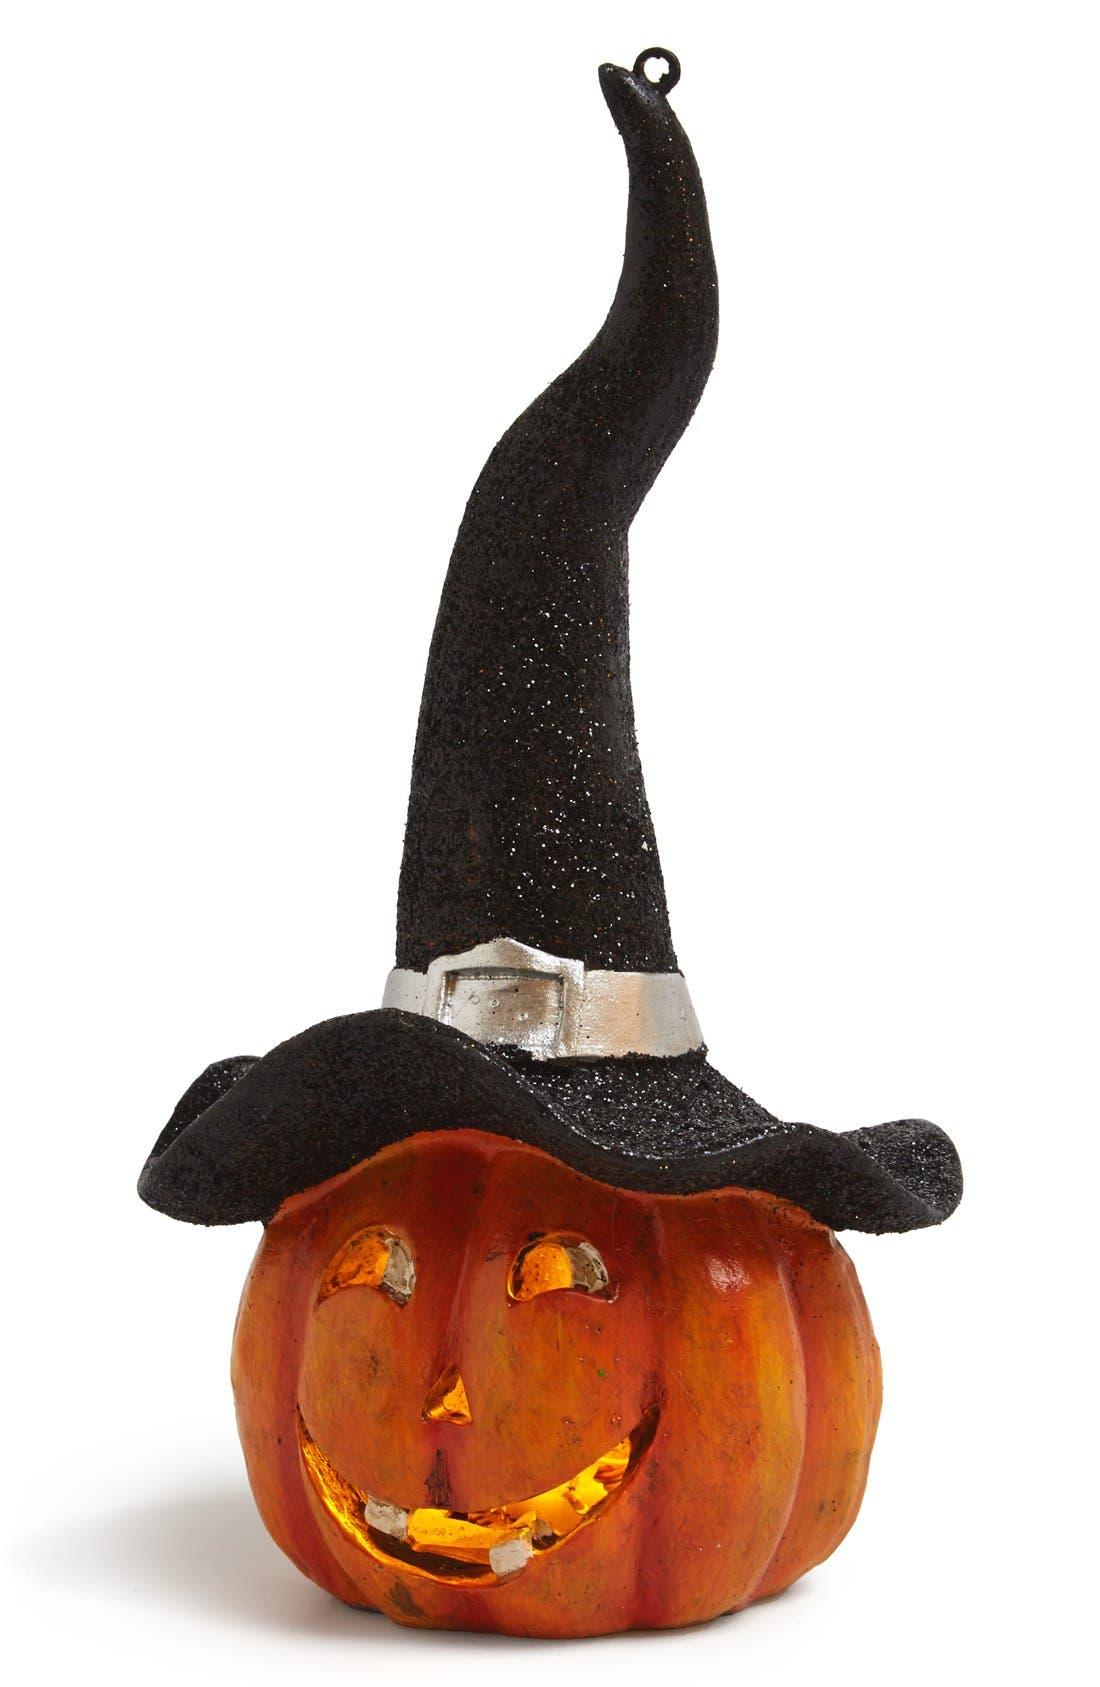 Main Image - Fantastic Craft 'Jack-o'-Pumpkin' Light Up Pumpkin Decoration